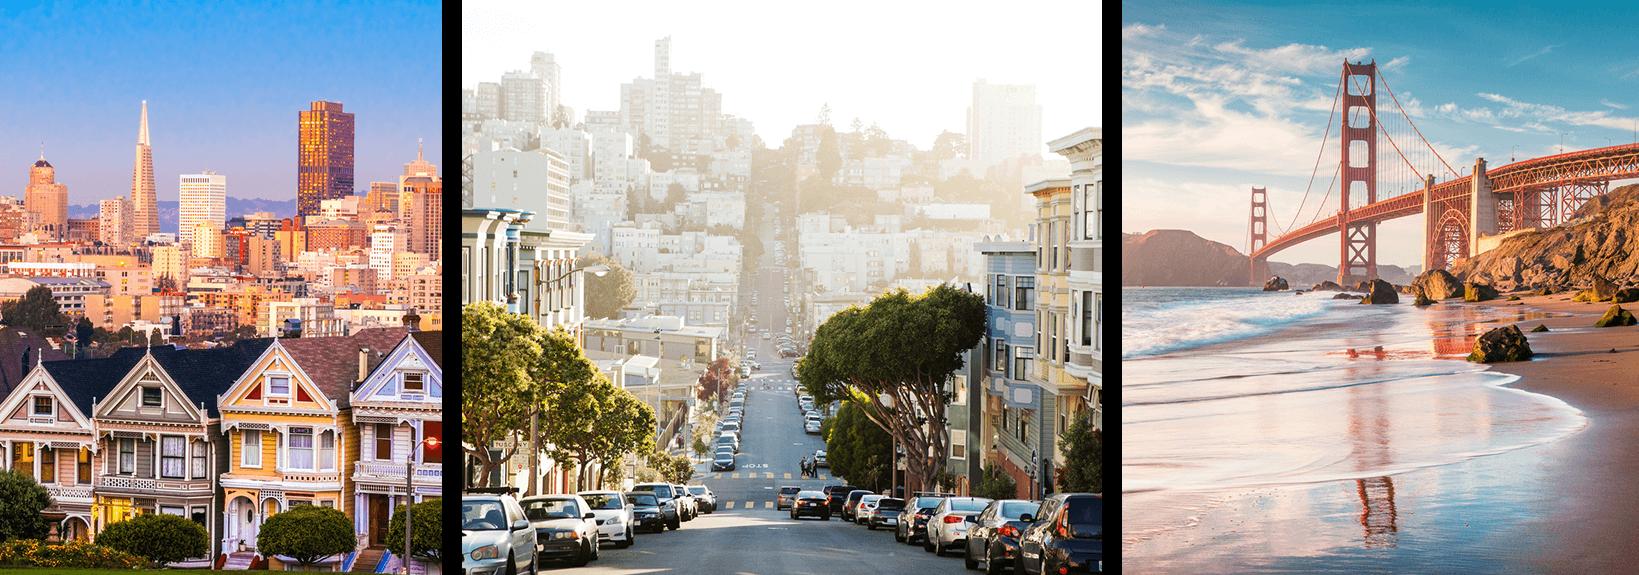 San Francisco sightseeing locations